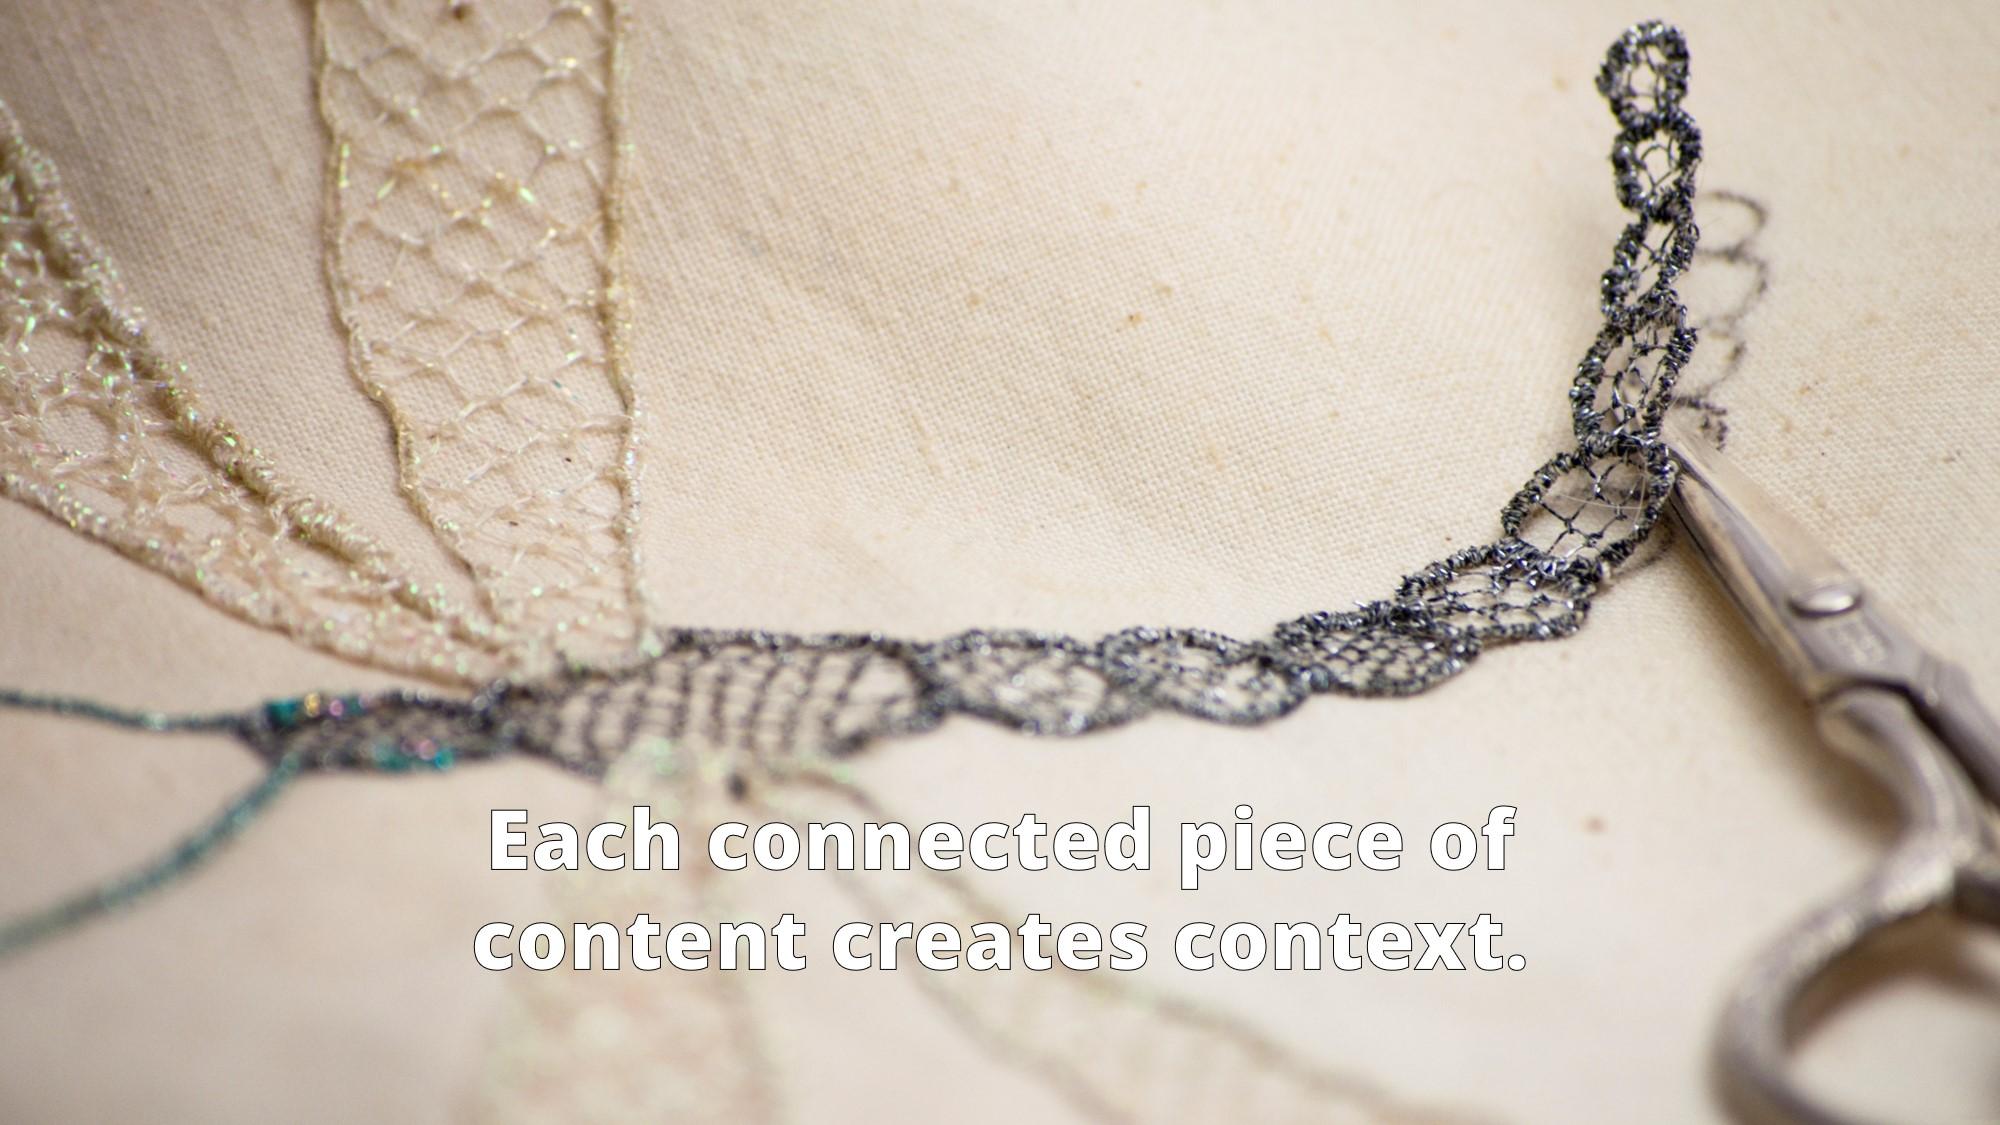 171219-content-marketing-creates-context.jpg